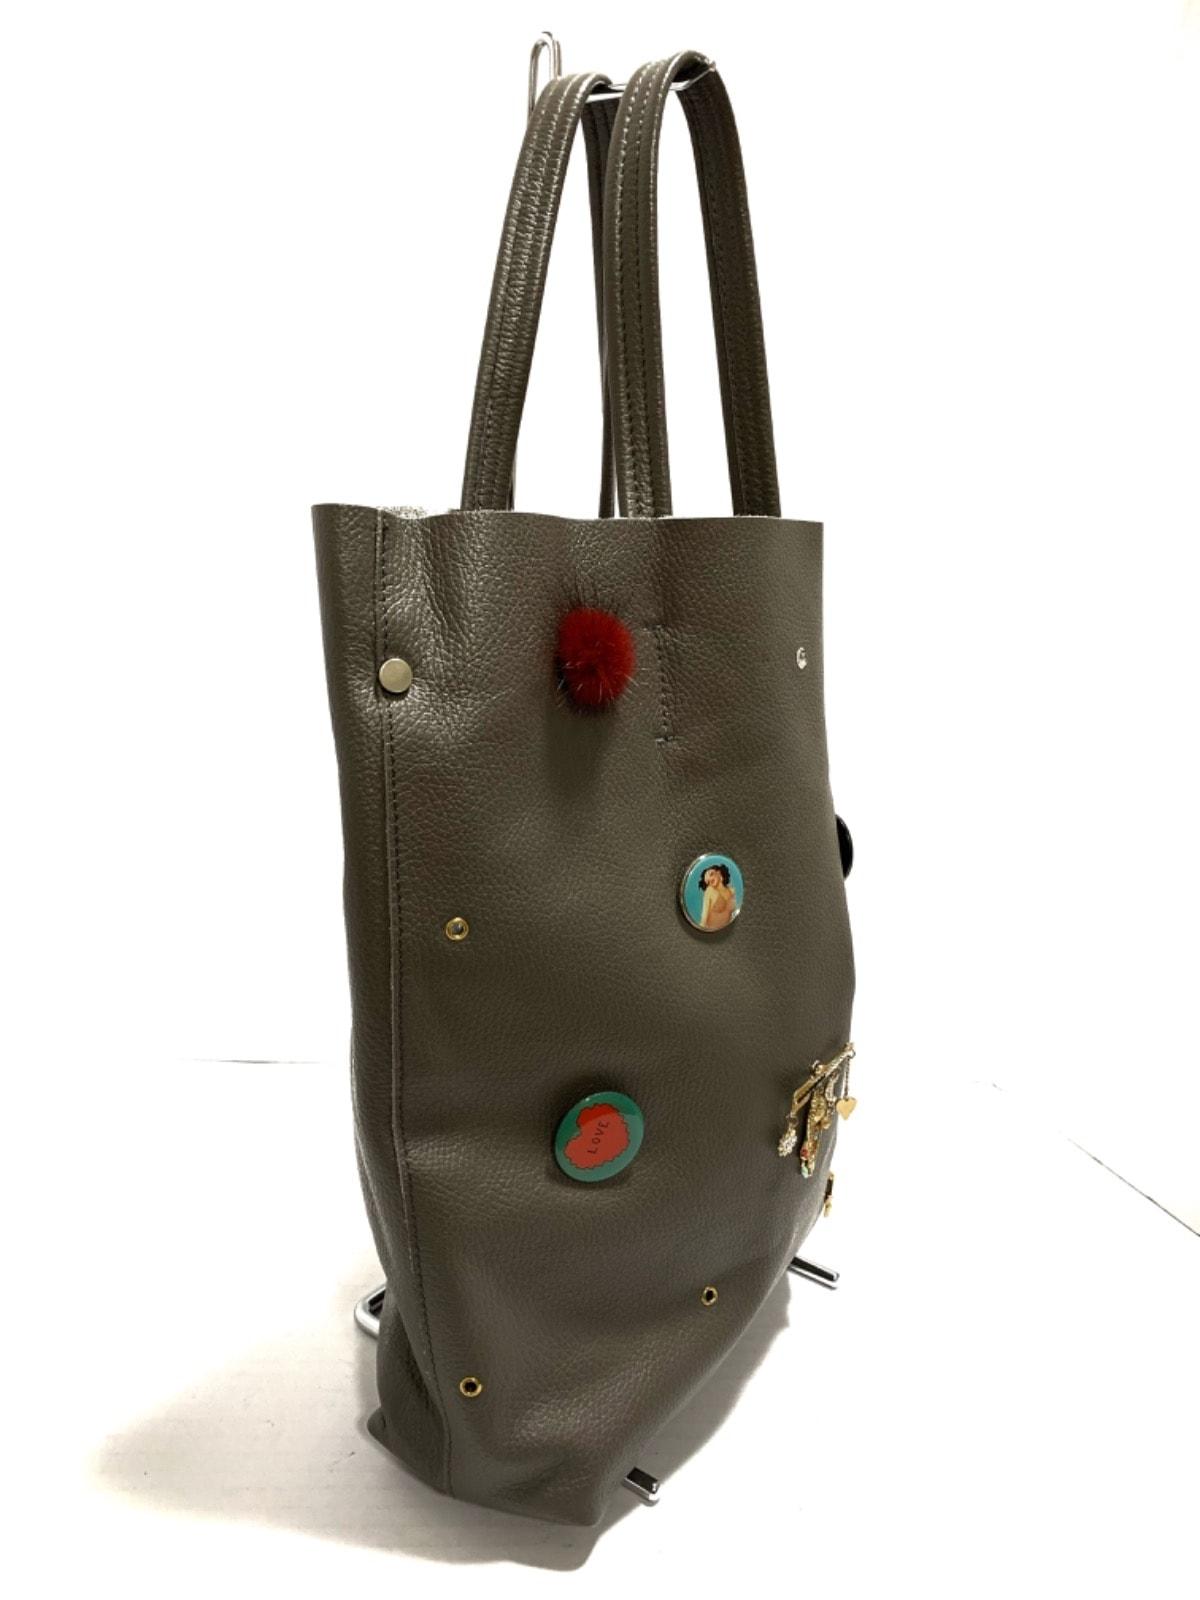 BAGOLO(バゴロ)のトートバッグ